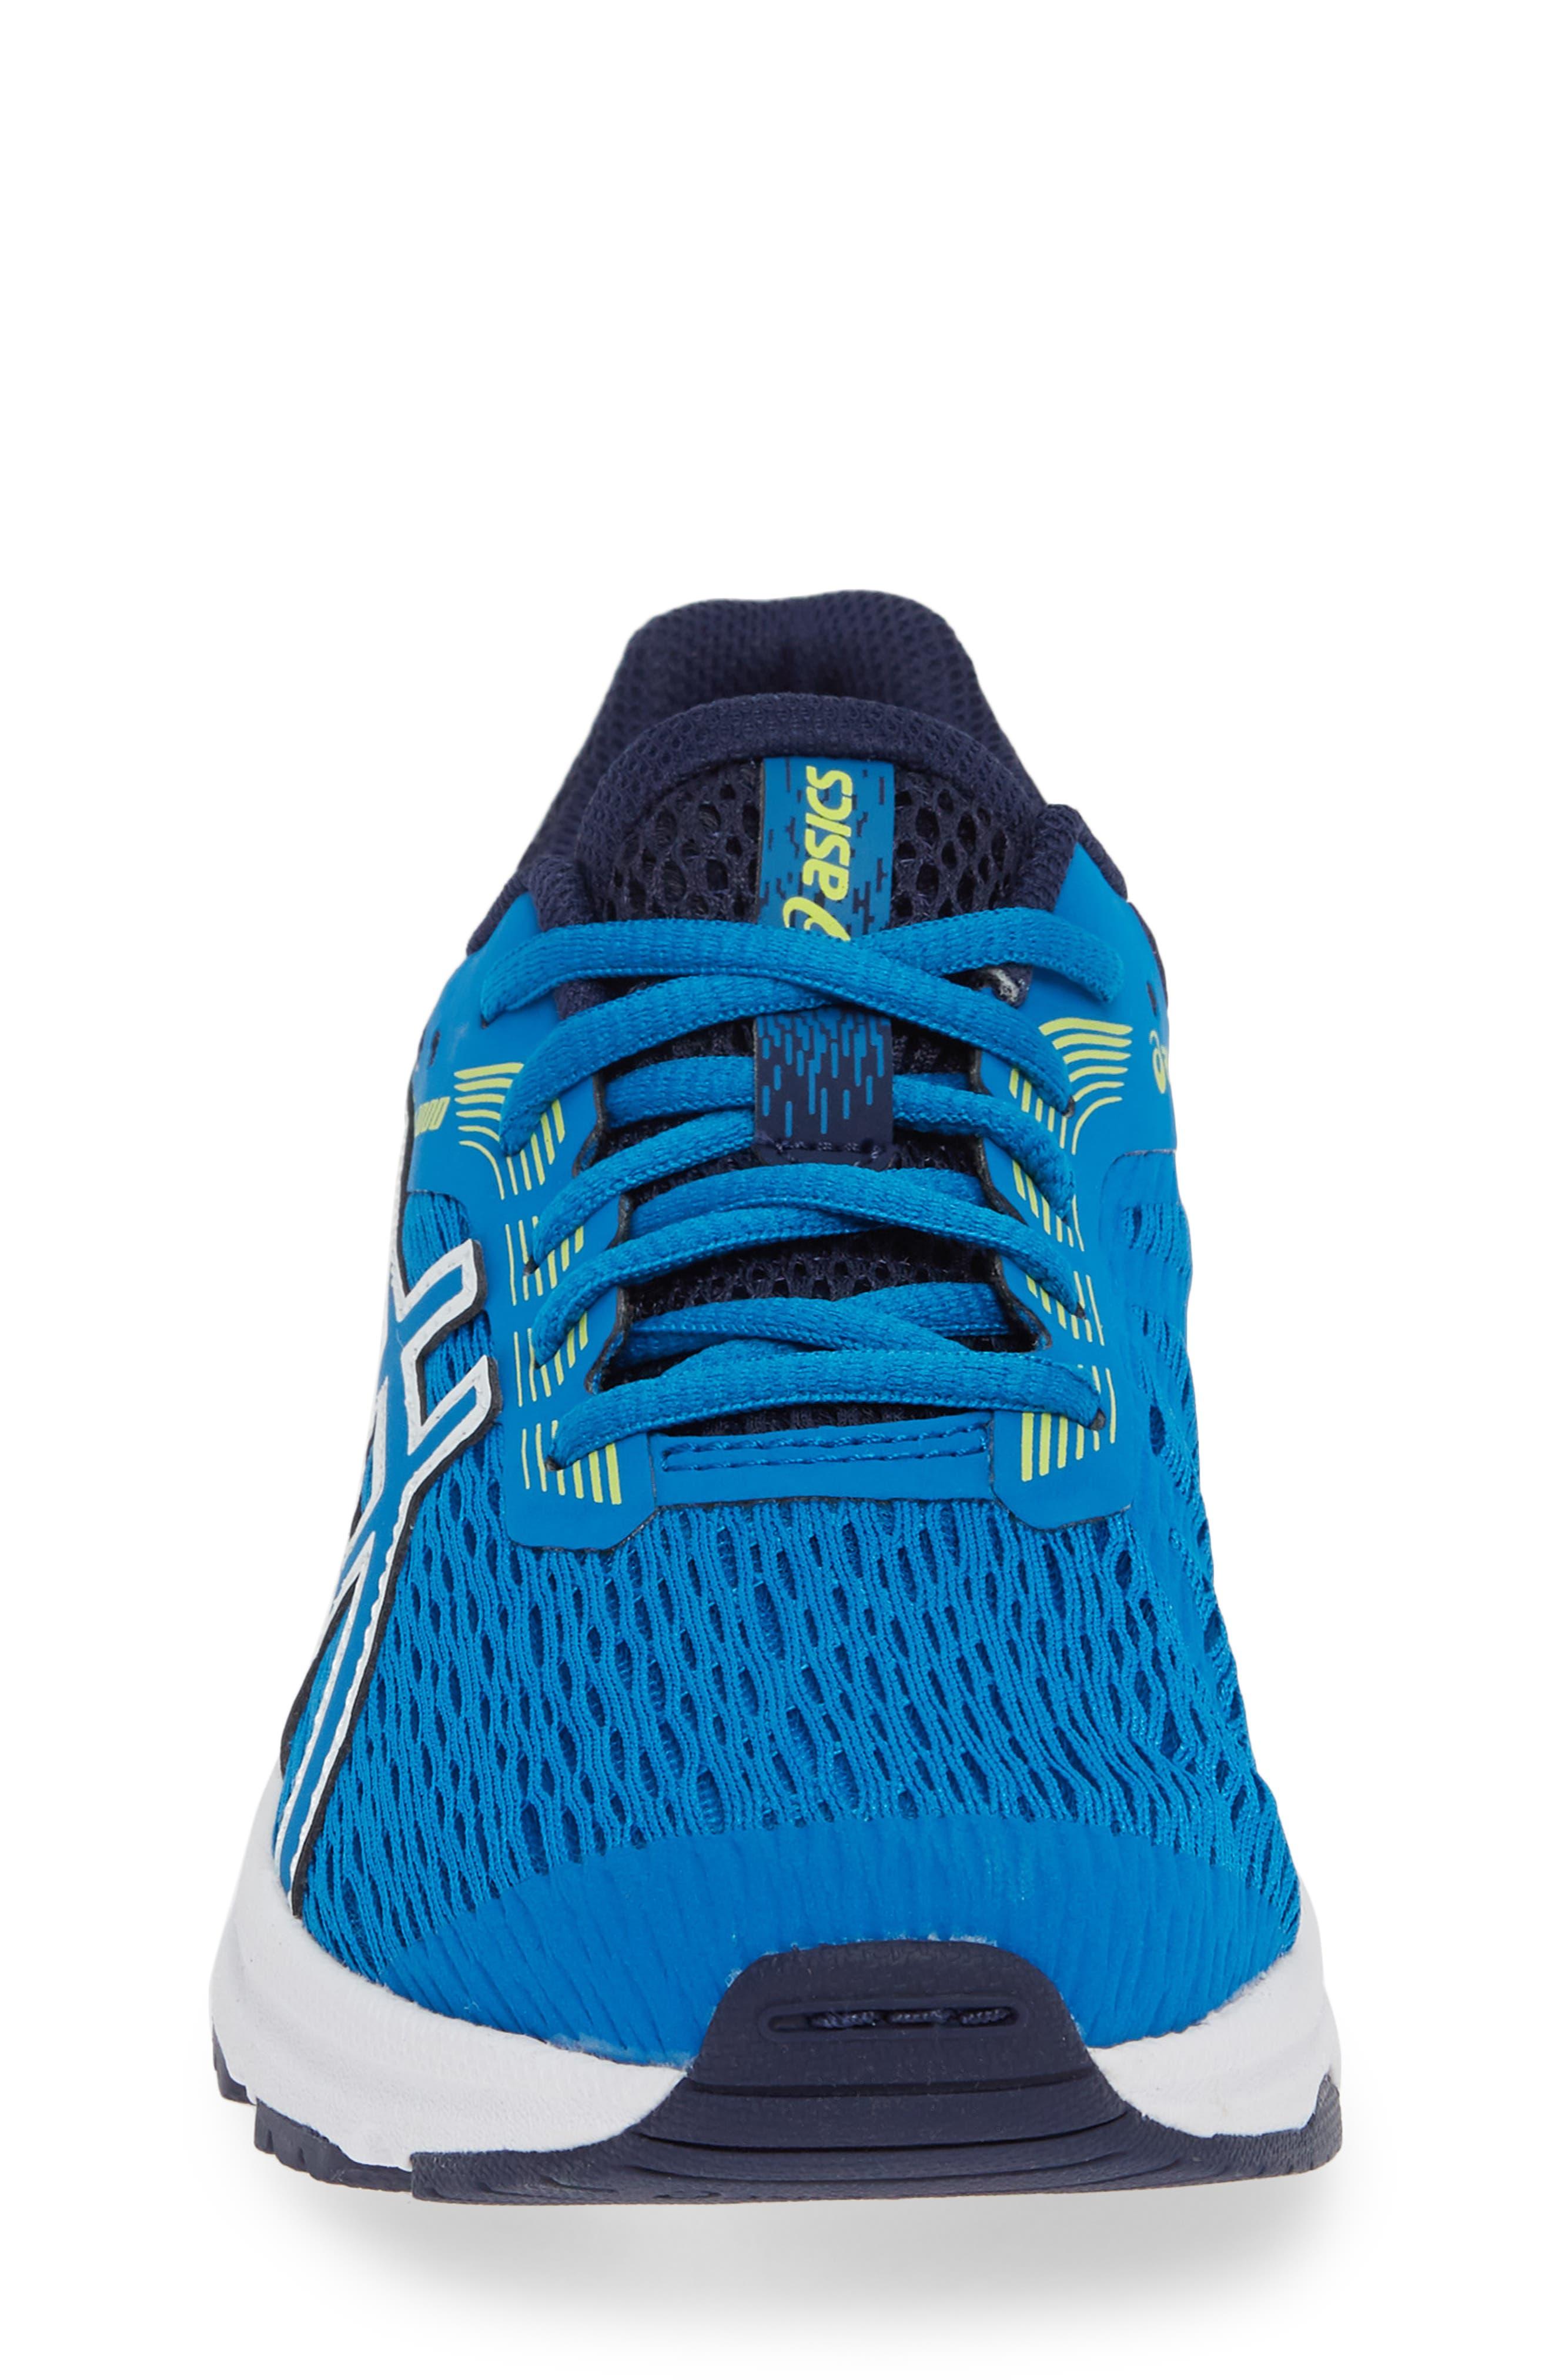 GT 1000 7 Running Shoe,                             Alternate thumbnail 4, color,                             RACE BLUE/ NEON LIME